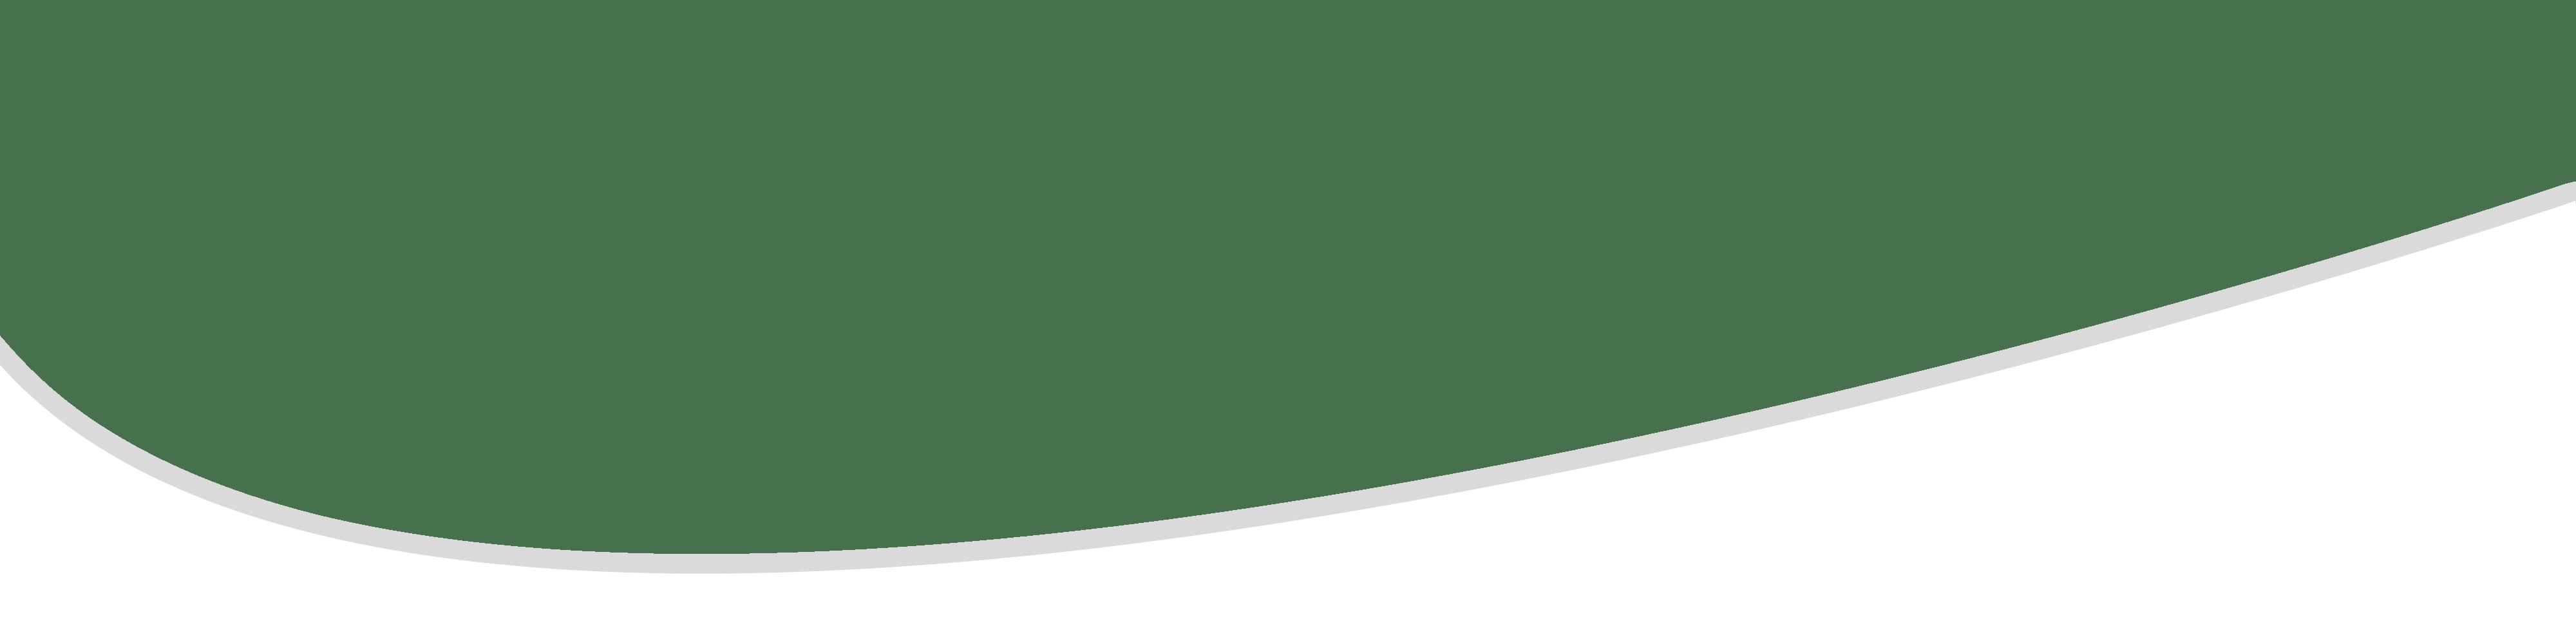 i-gb-schwung-medium-dynamisch